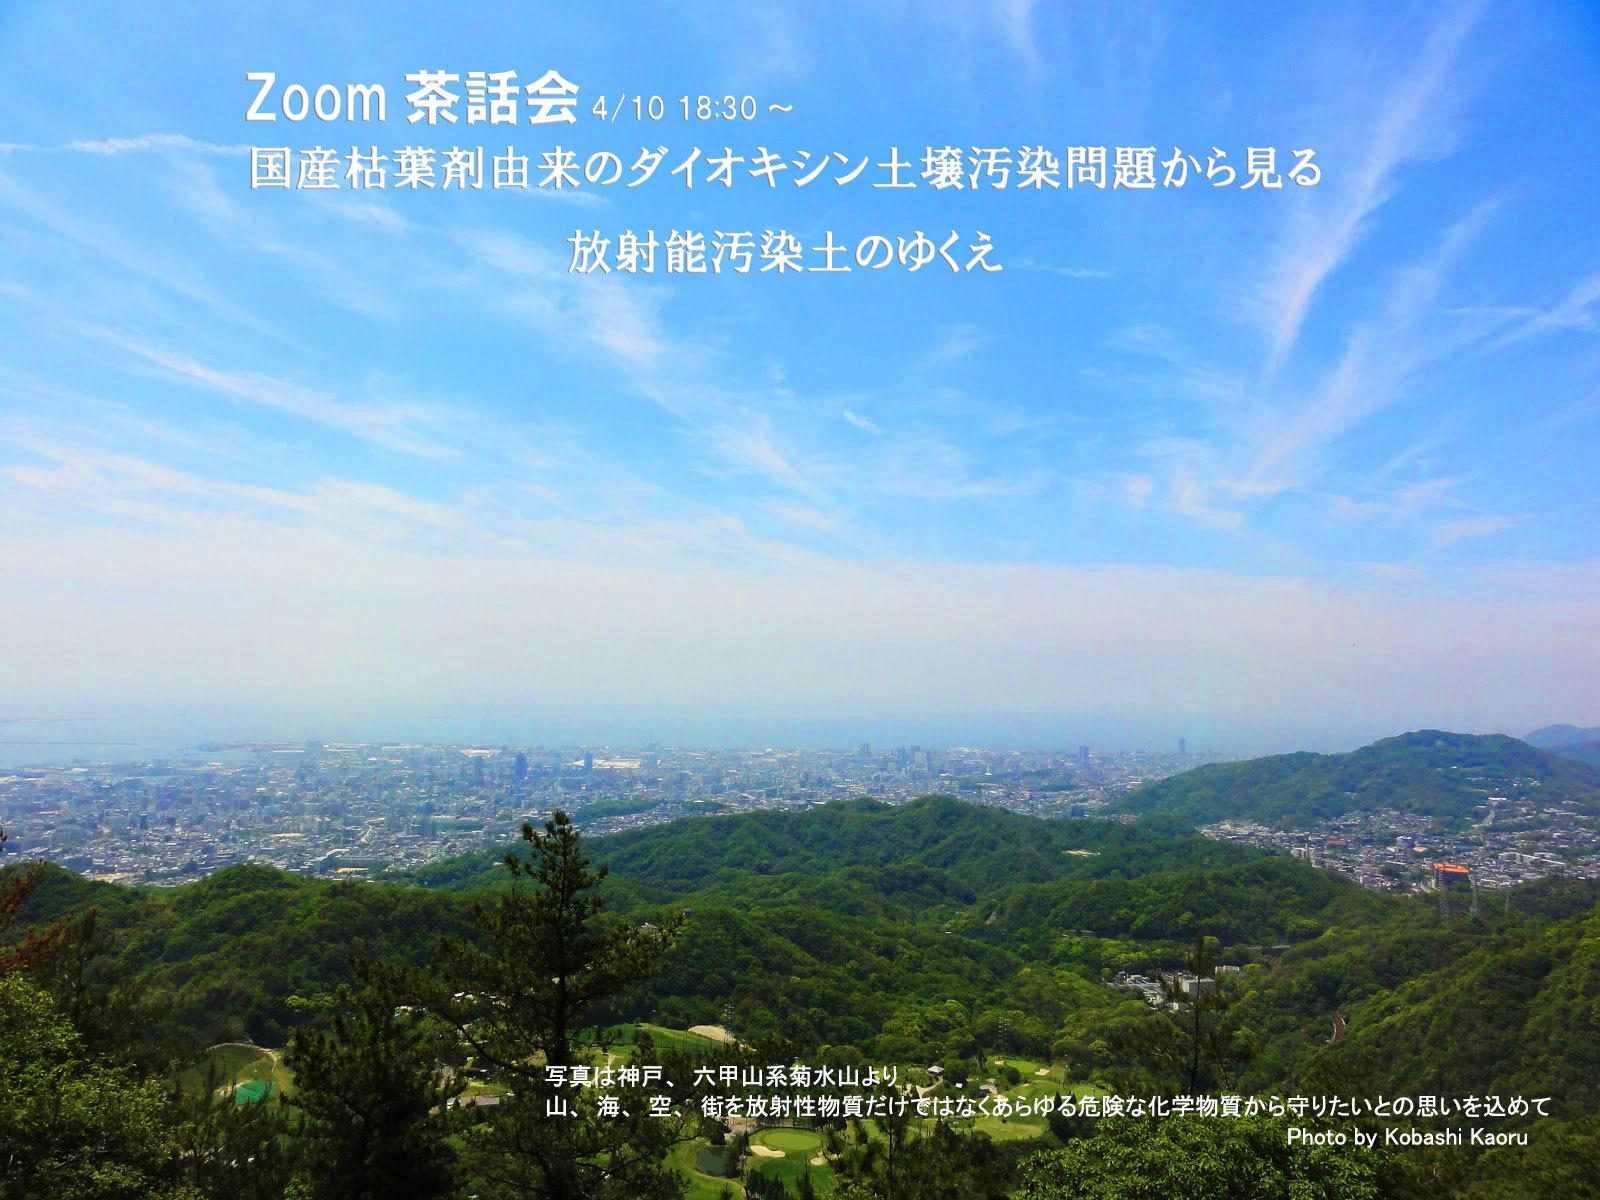 210410ZoomTitle.jpg